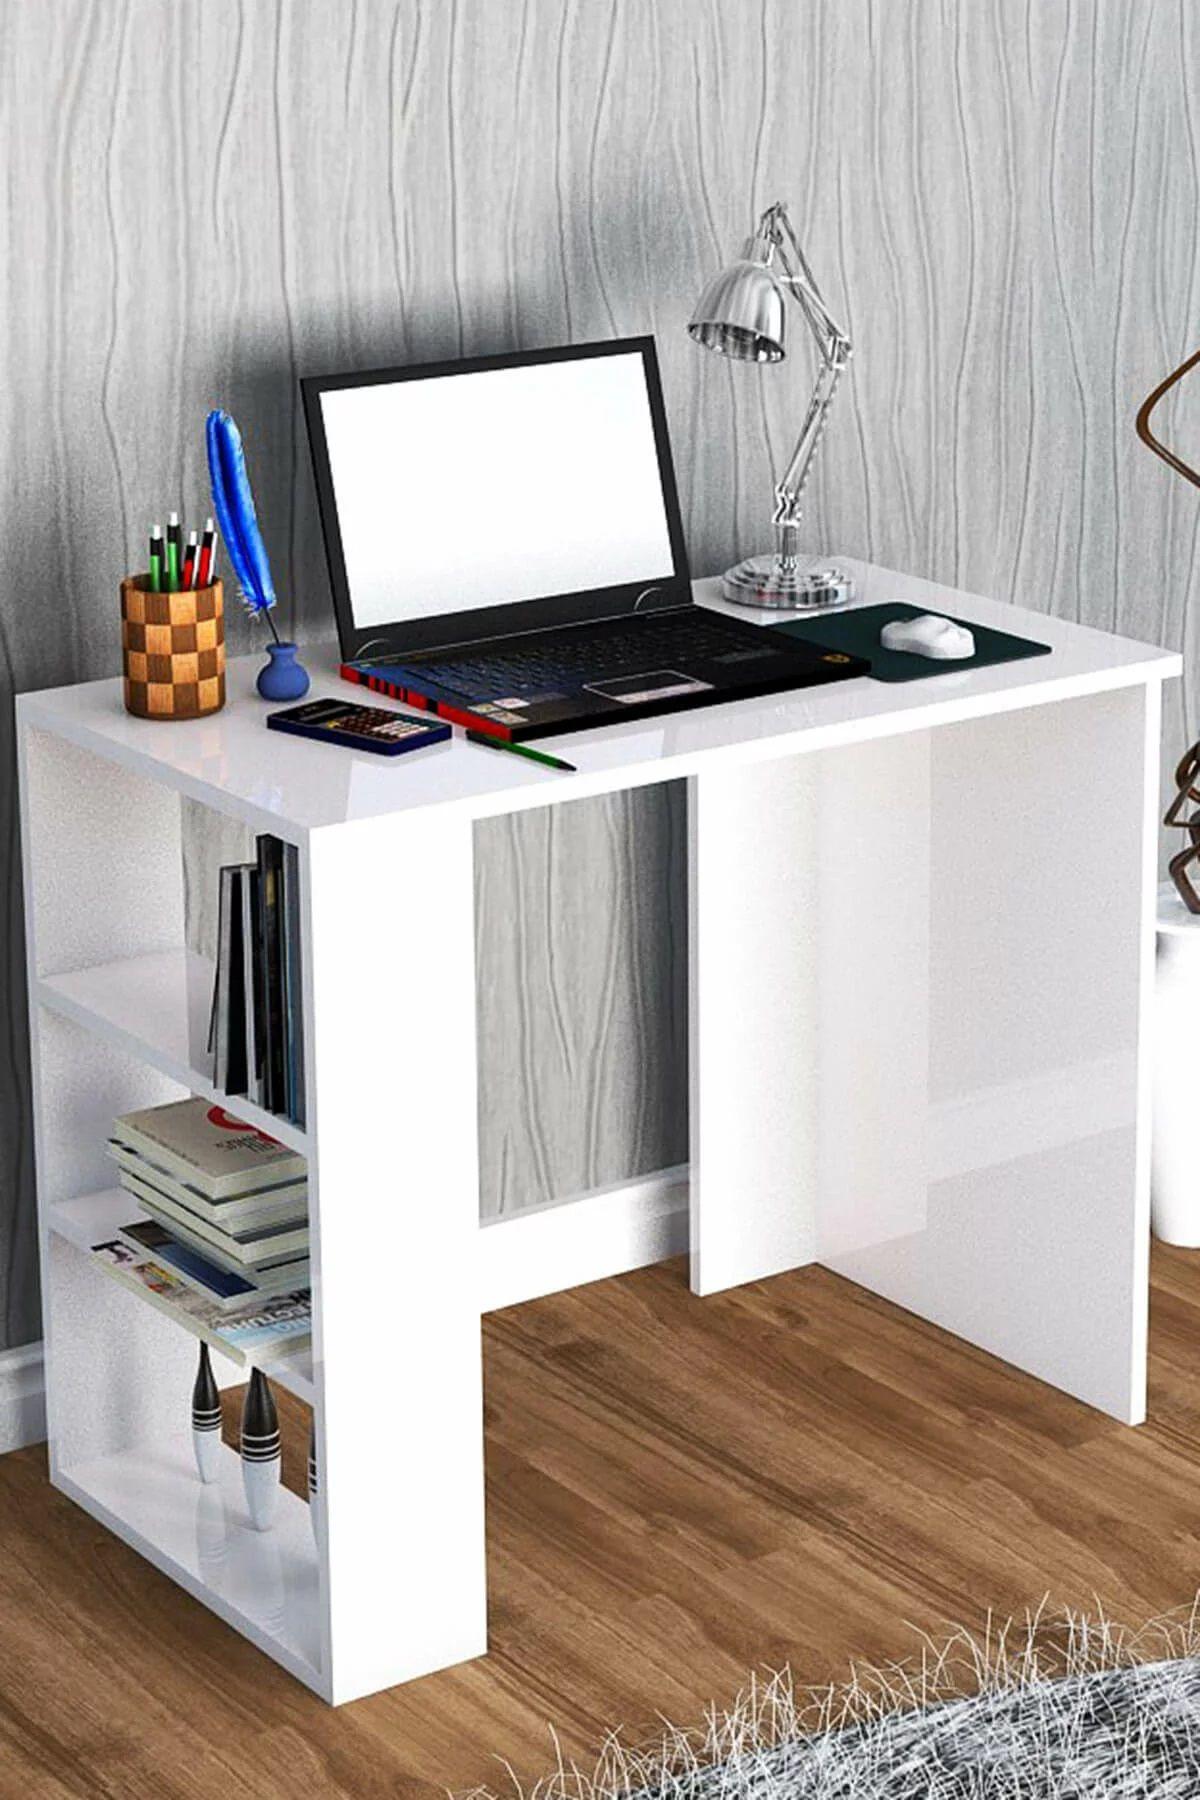 Birou cu rafturi Cool Homs, alb, 90 x 50 x 70 cm, PAL 18 mm